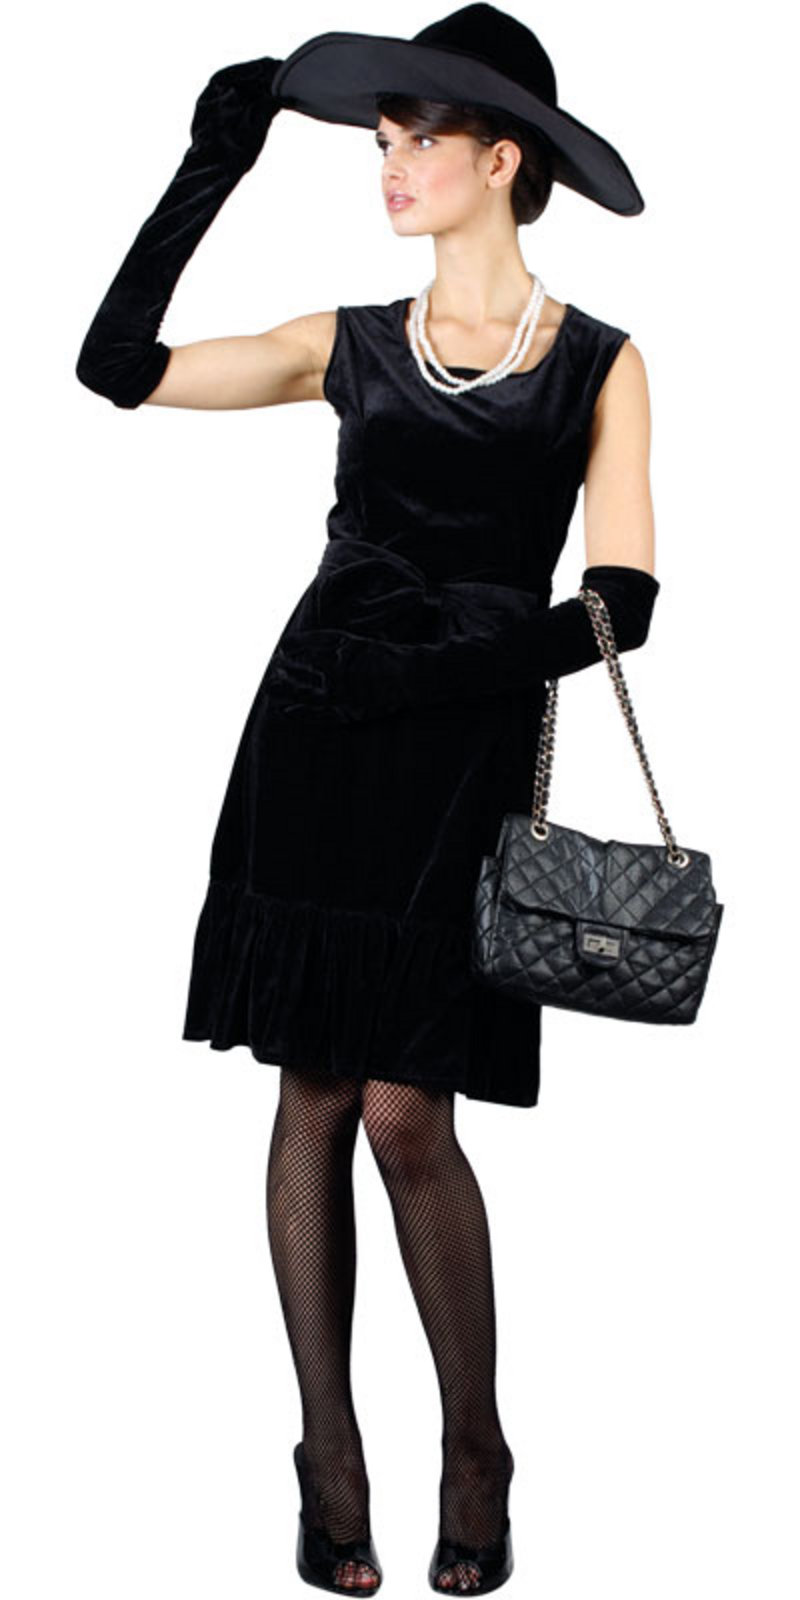 audrey hepburn style dress rachael edwards. Black Bedroom Furniture Sets. Home Design Ideas